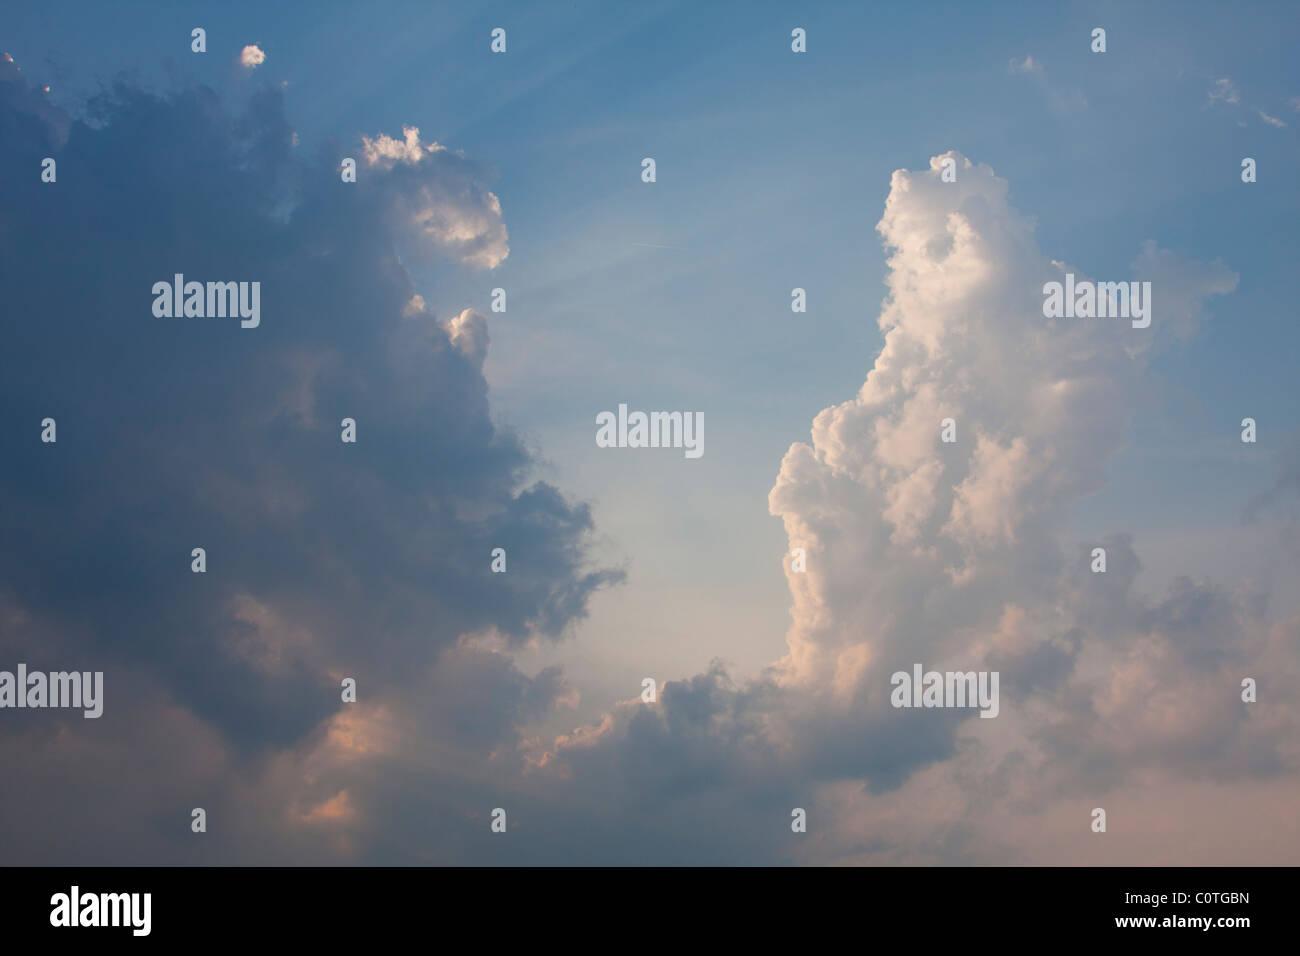 Sunlight breaks from behind a cumulonimbus cloud in the late evening. - Stock Image